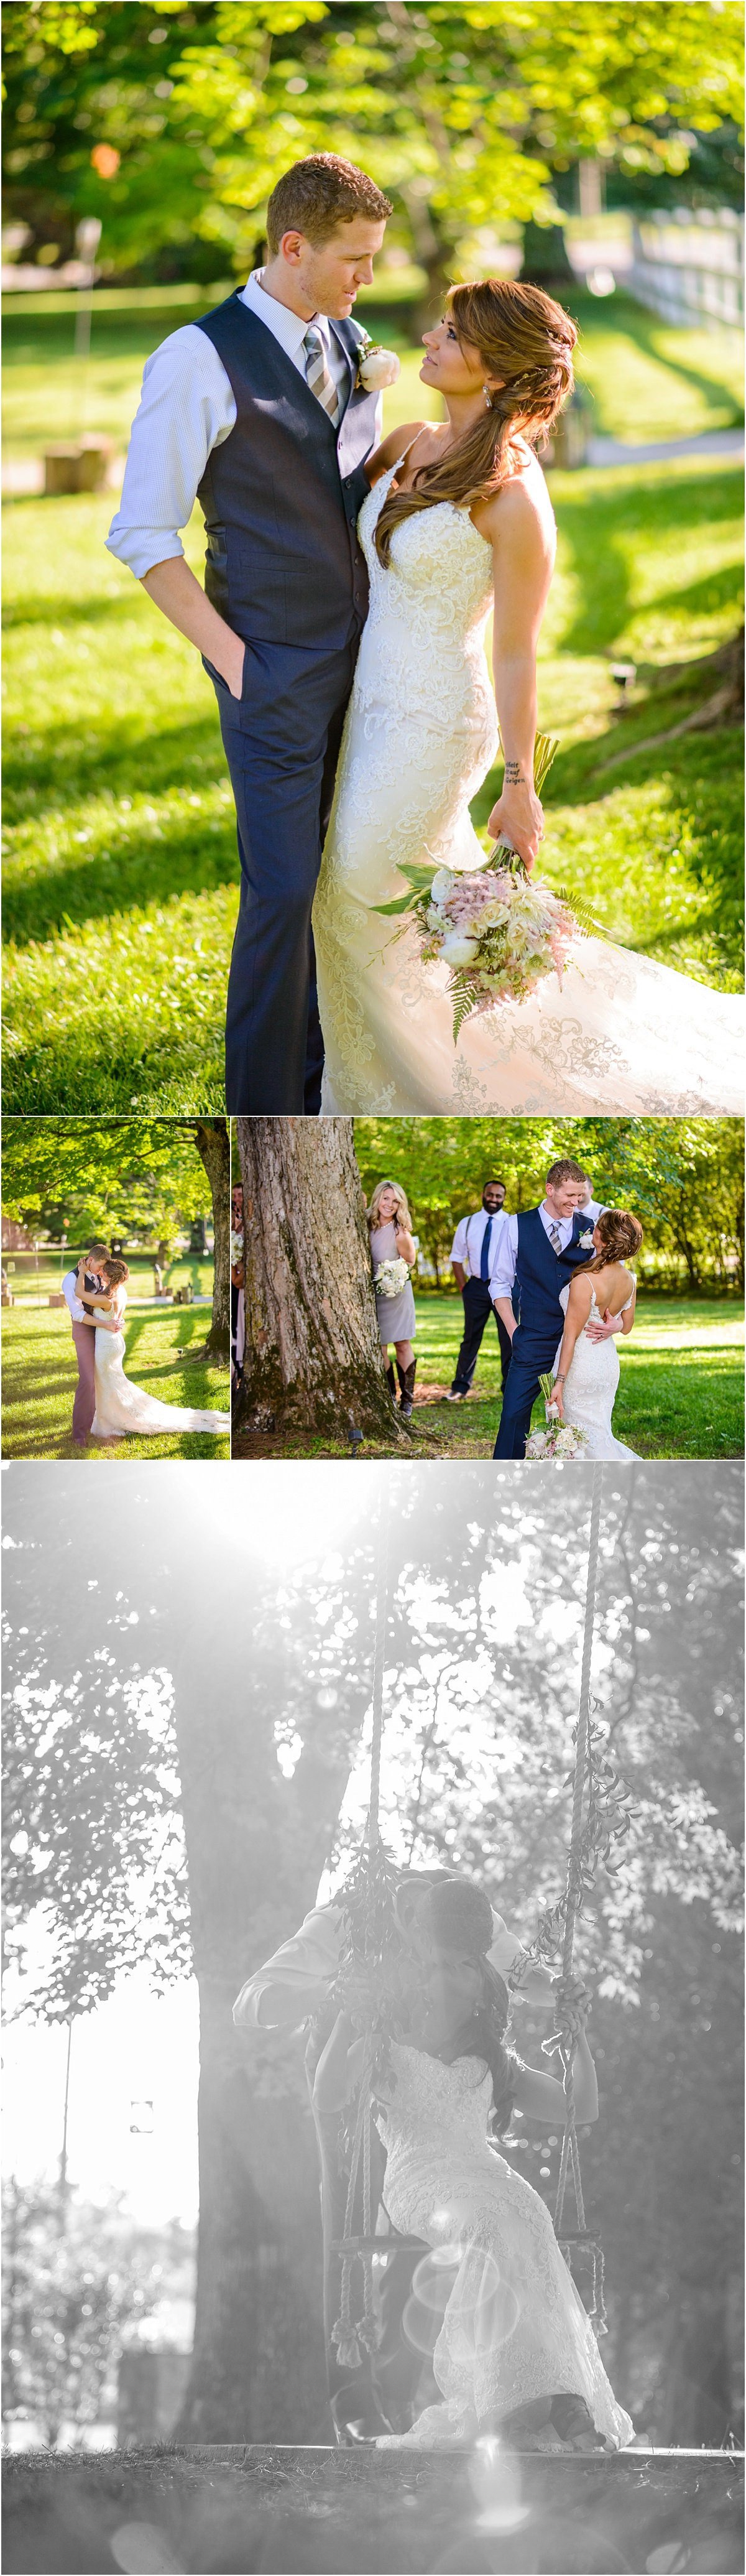 Greg Smit Photography Nashville wedding photographer Cedarwood Weddings_0051